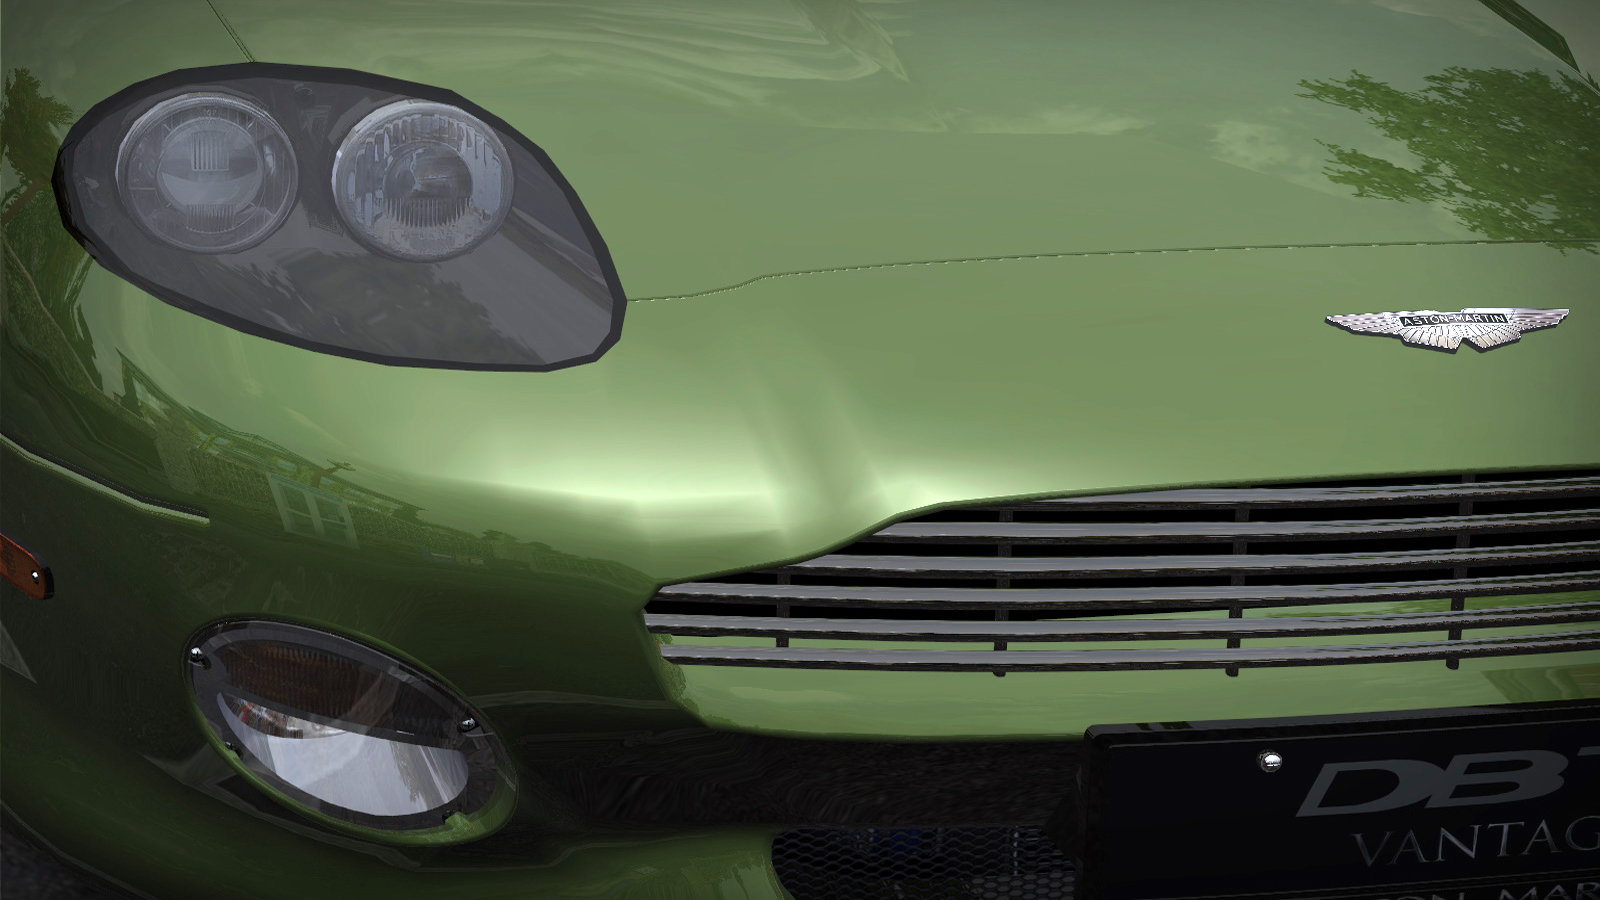 Speed 2020-01-05 18-49-57-649.jpg - Need for Speed: Most Wanted (2005) Aston Martin DB7 Vantage, Автомобиль